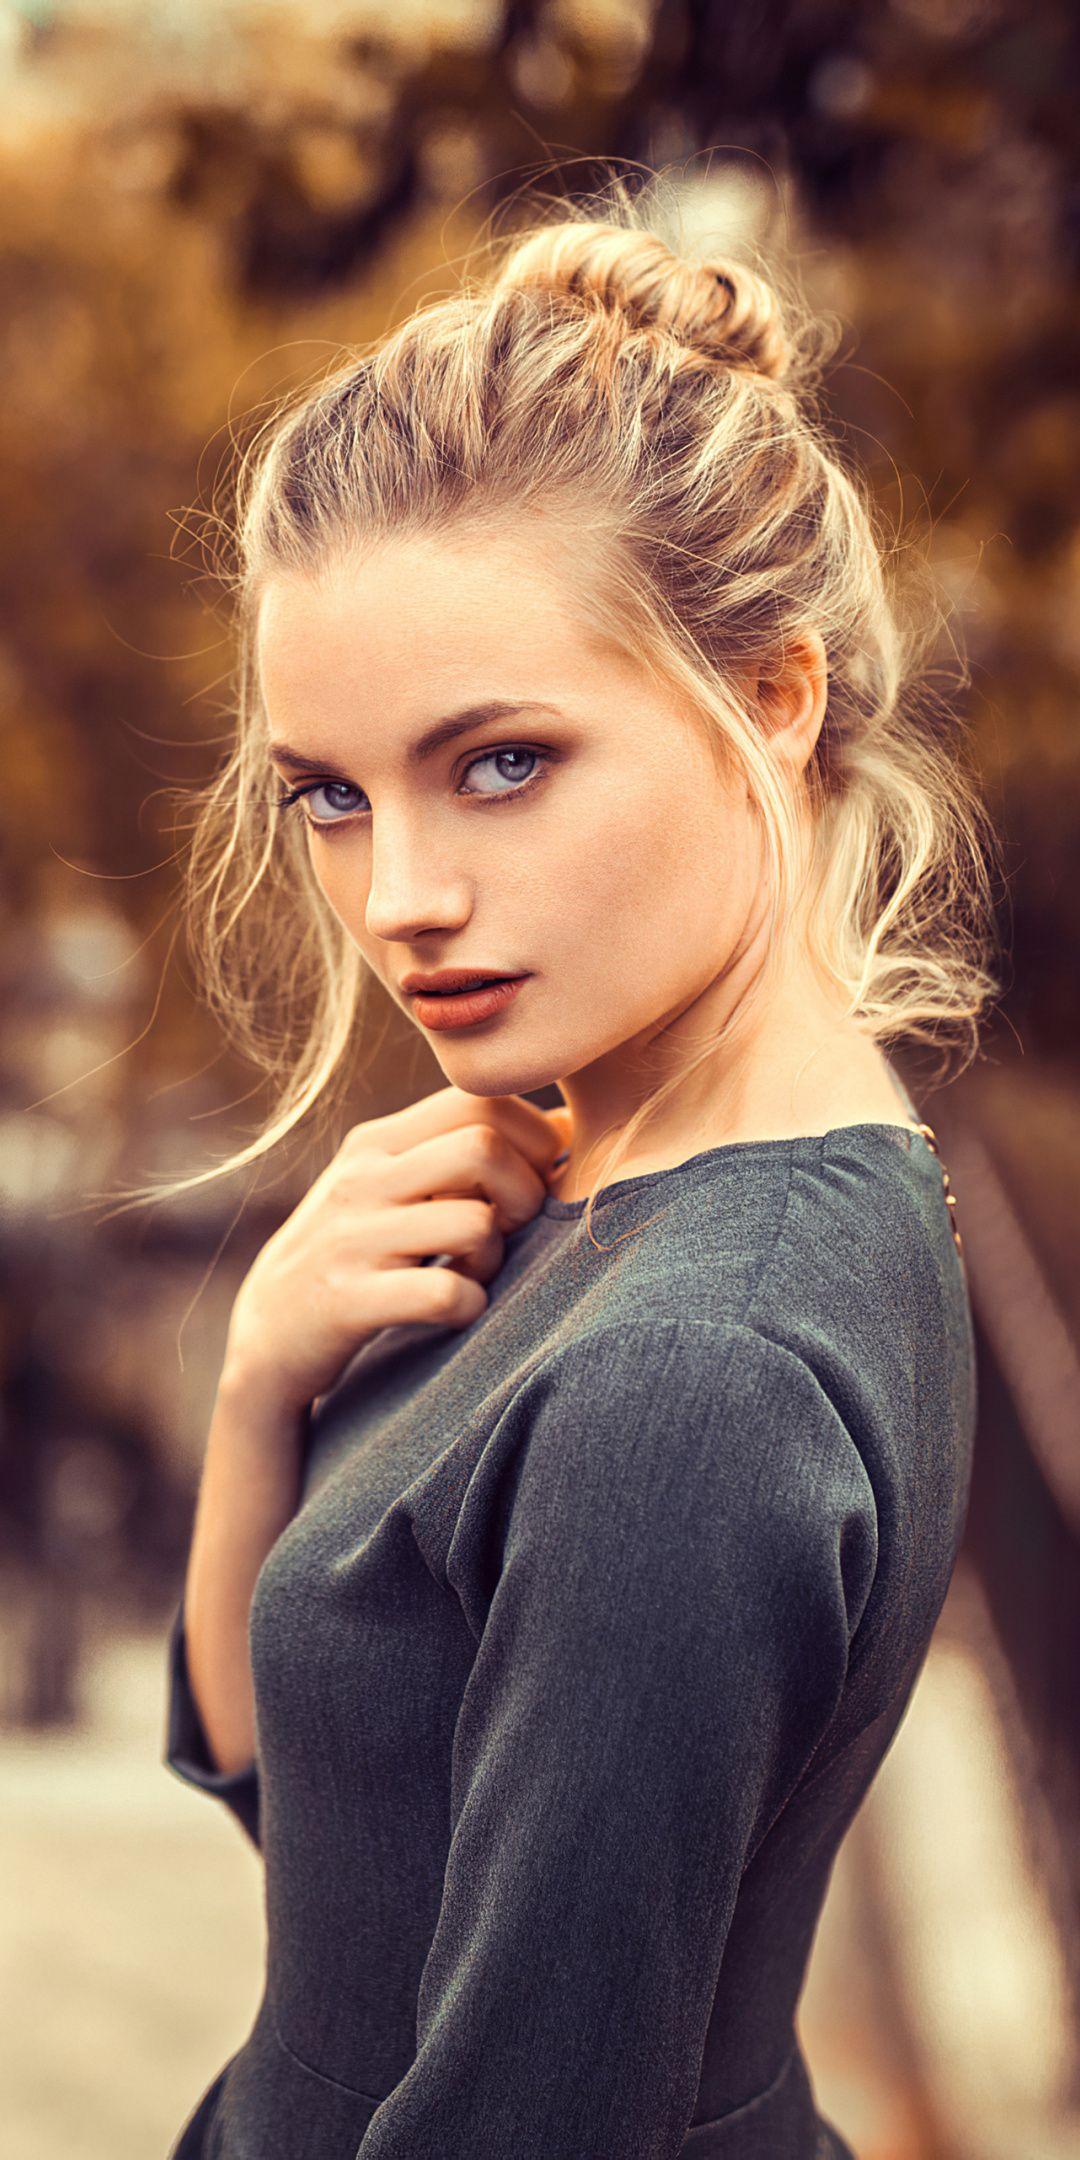 1080x2160 Blonde And Beautiful Woman Portrait Wallpaper Beautiful Girl Face Beautiful Model Girl Portrait Photography Women